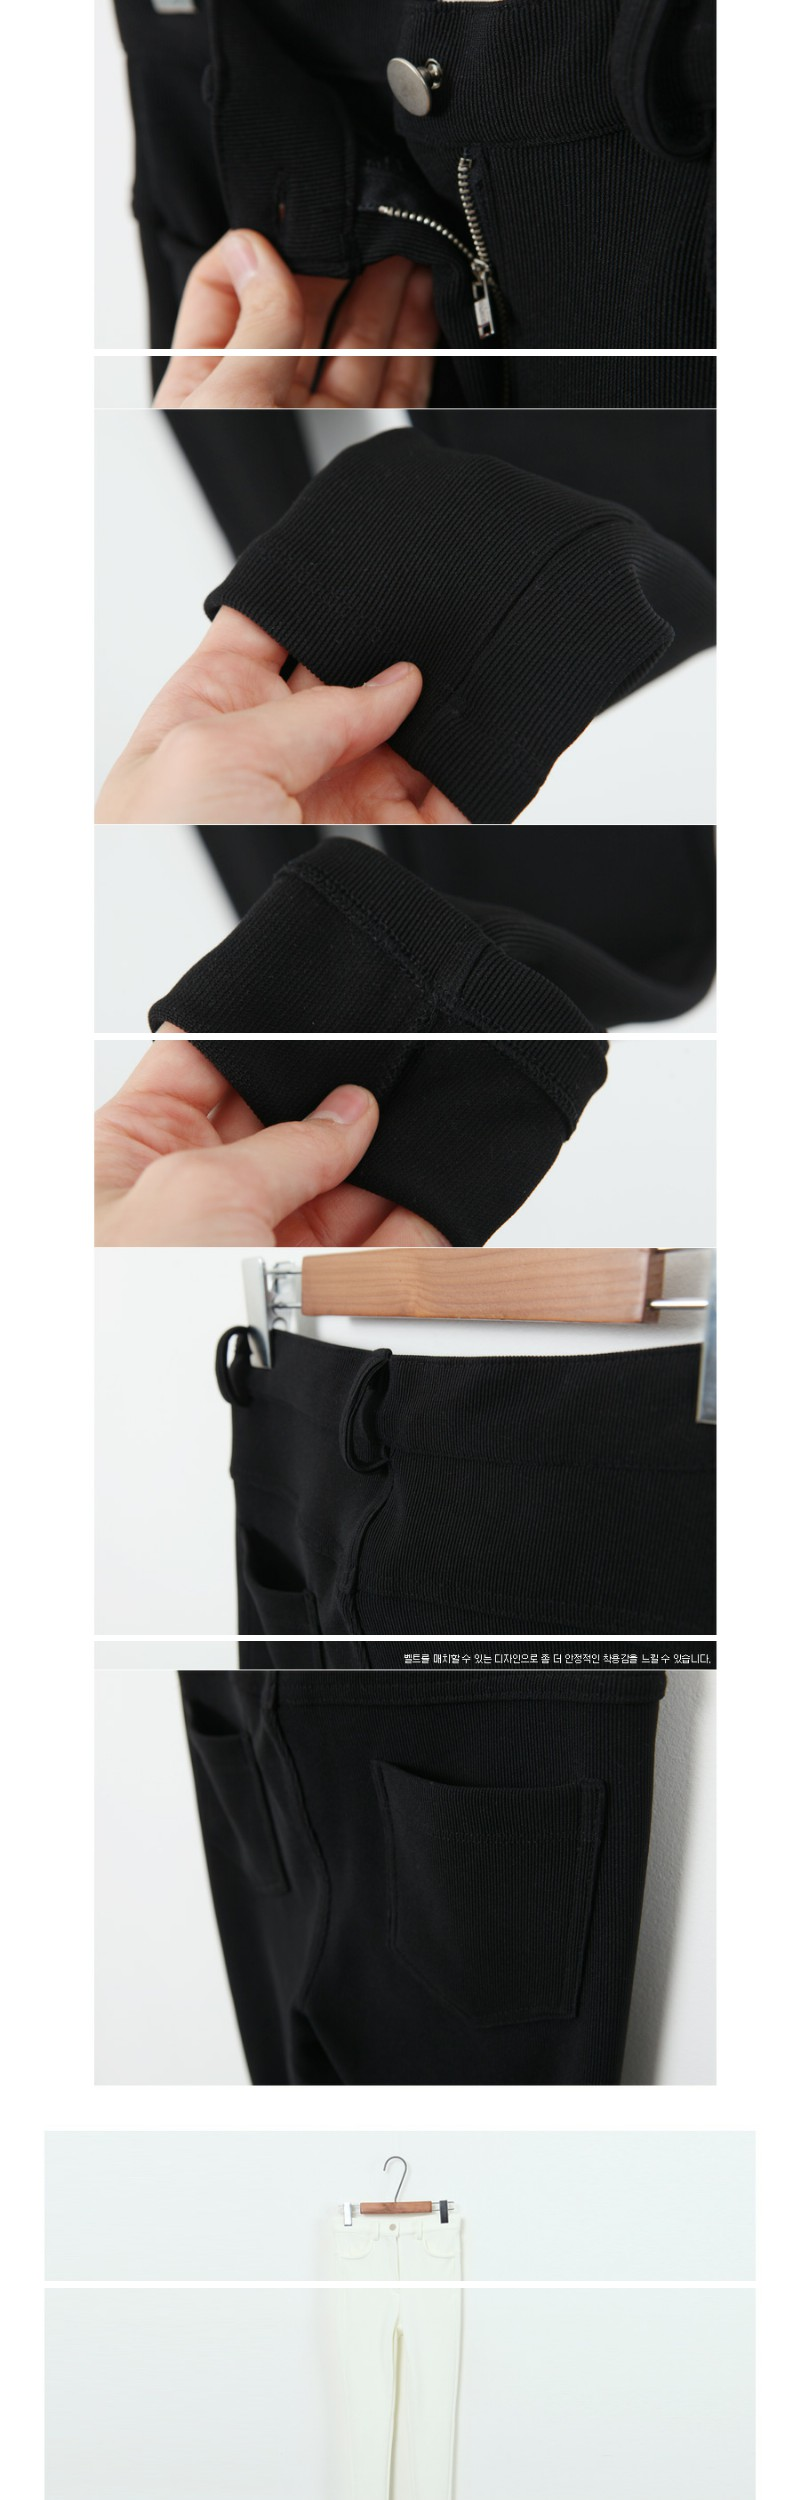 Belief golgi leggings pants